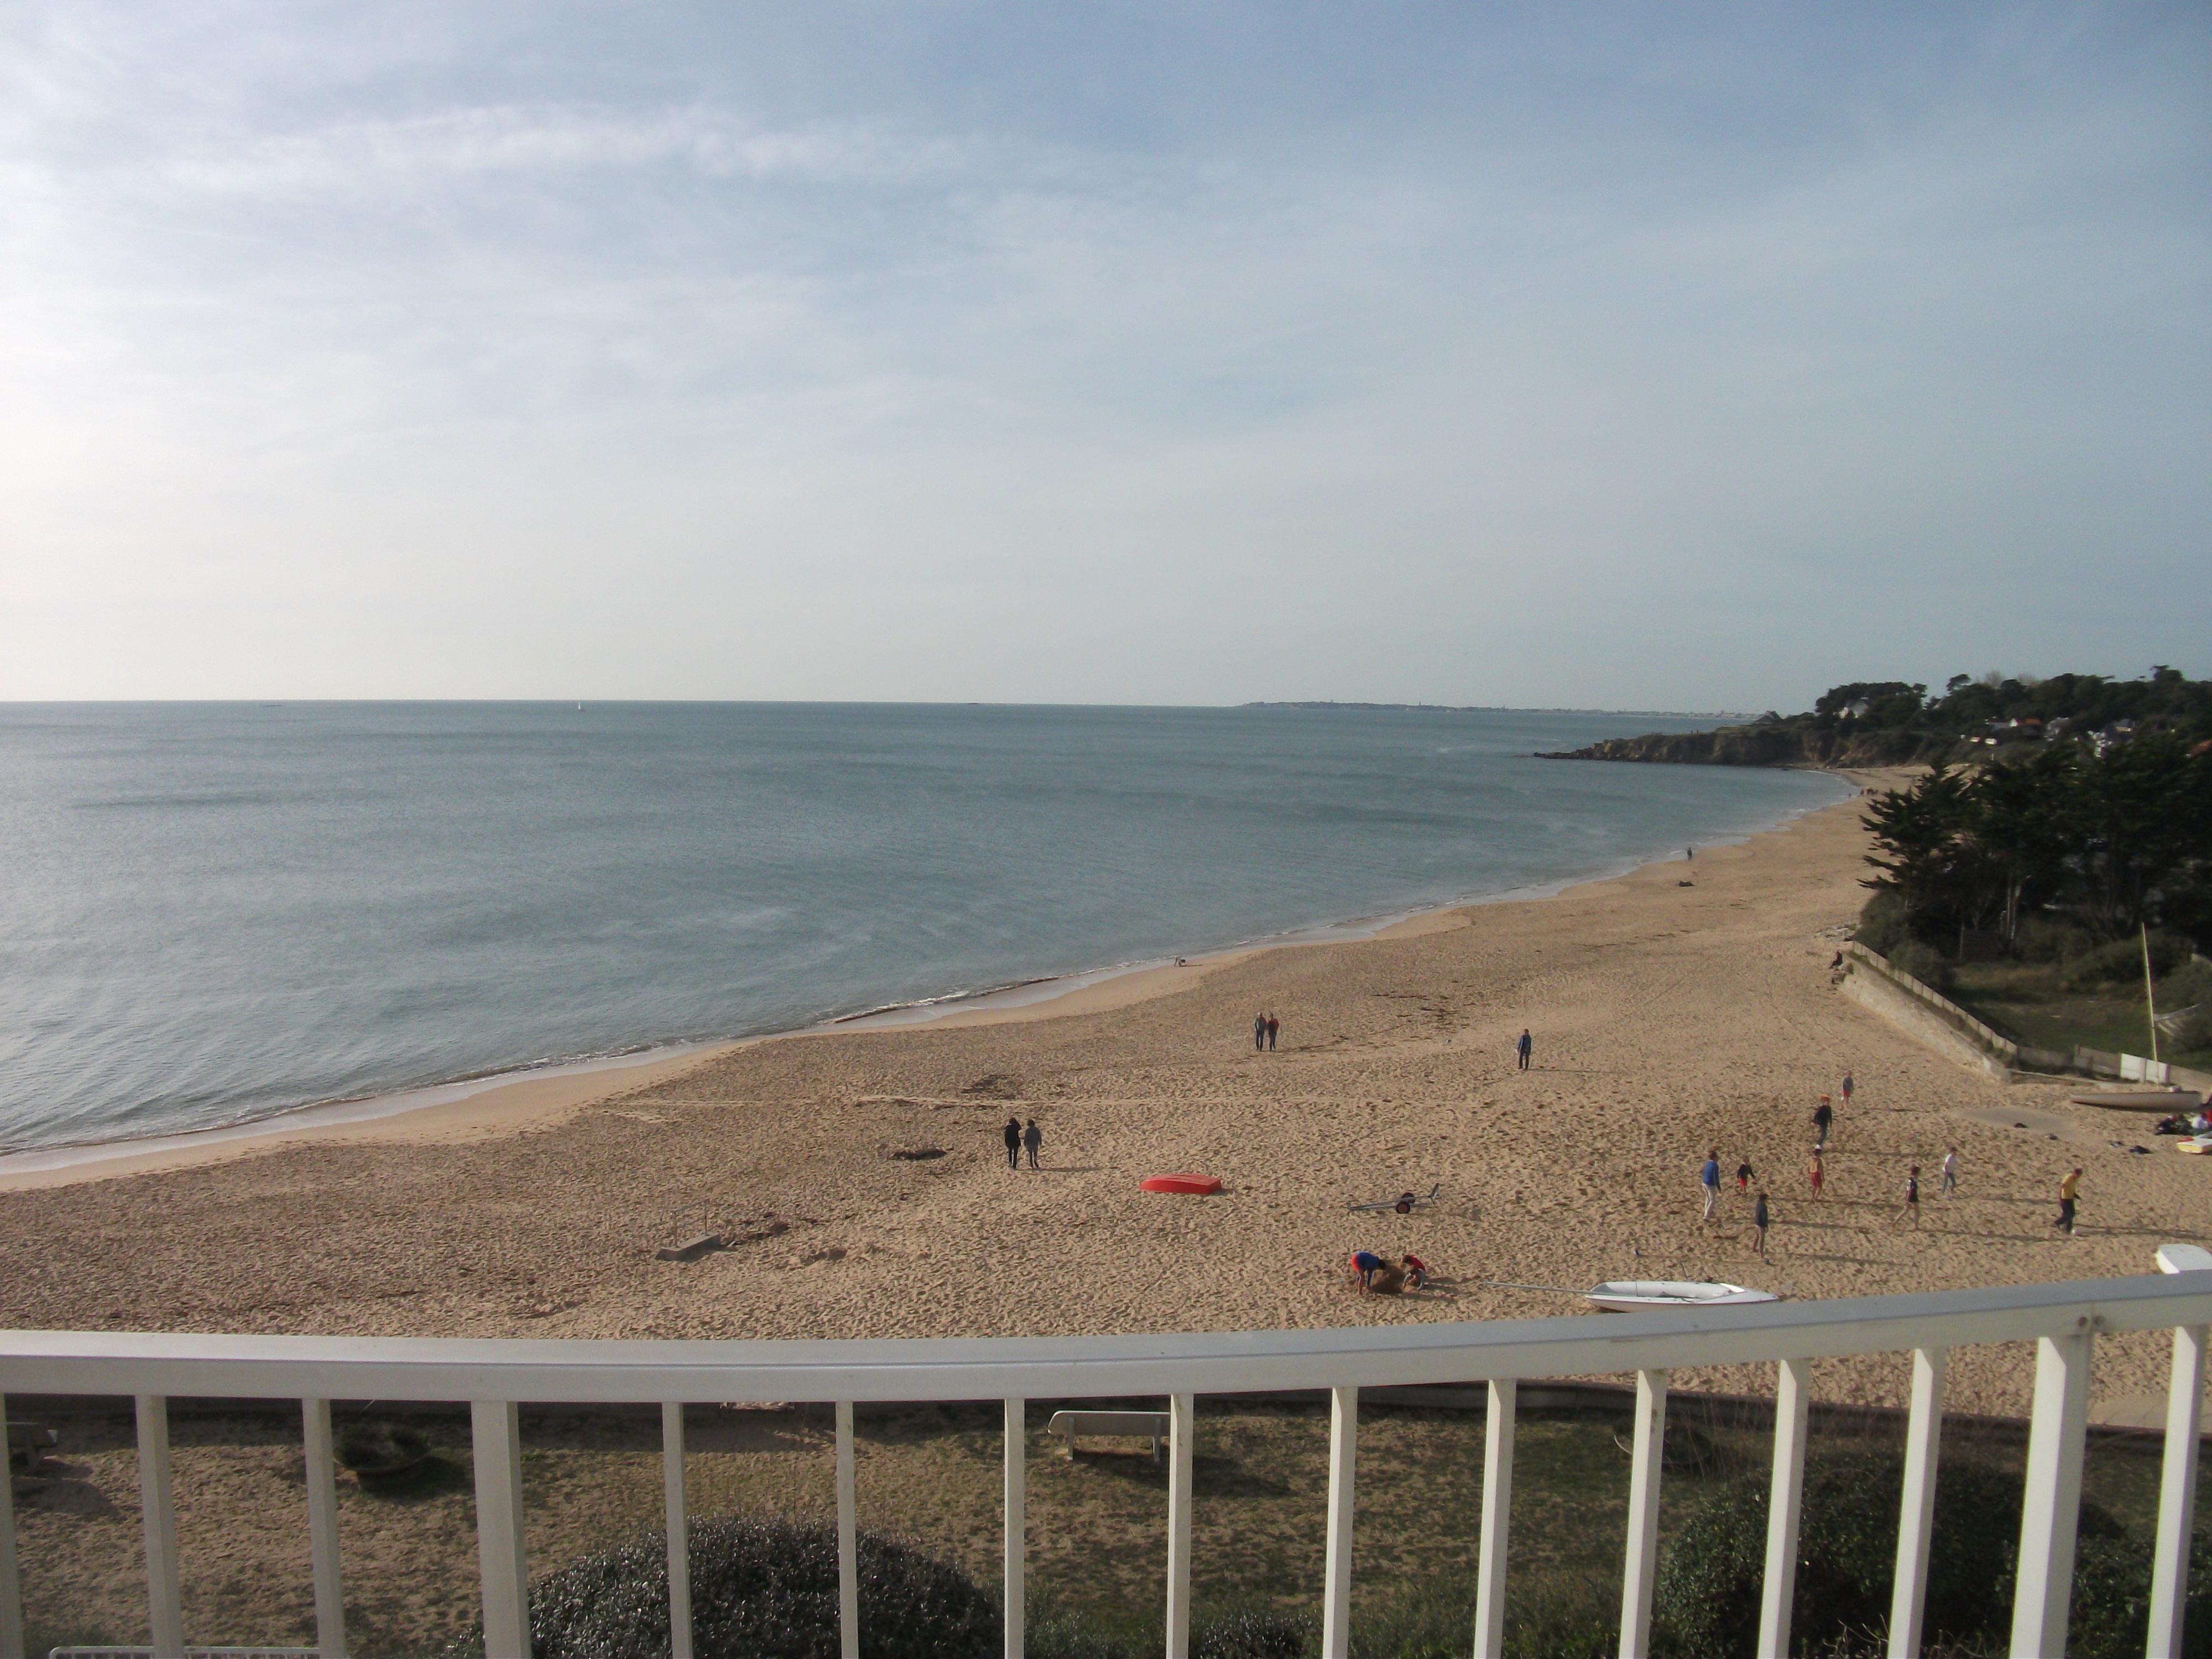 A vendre T3 -PORNICHET – Face mer accès direct plage -terrasse – garage